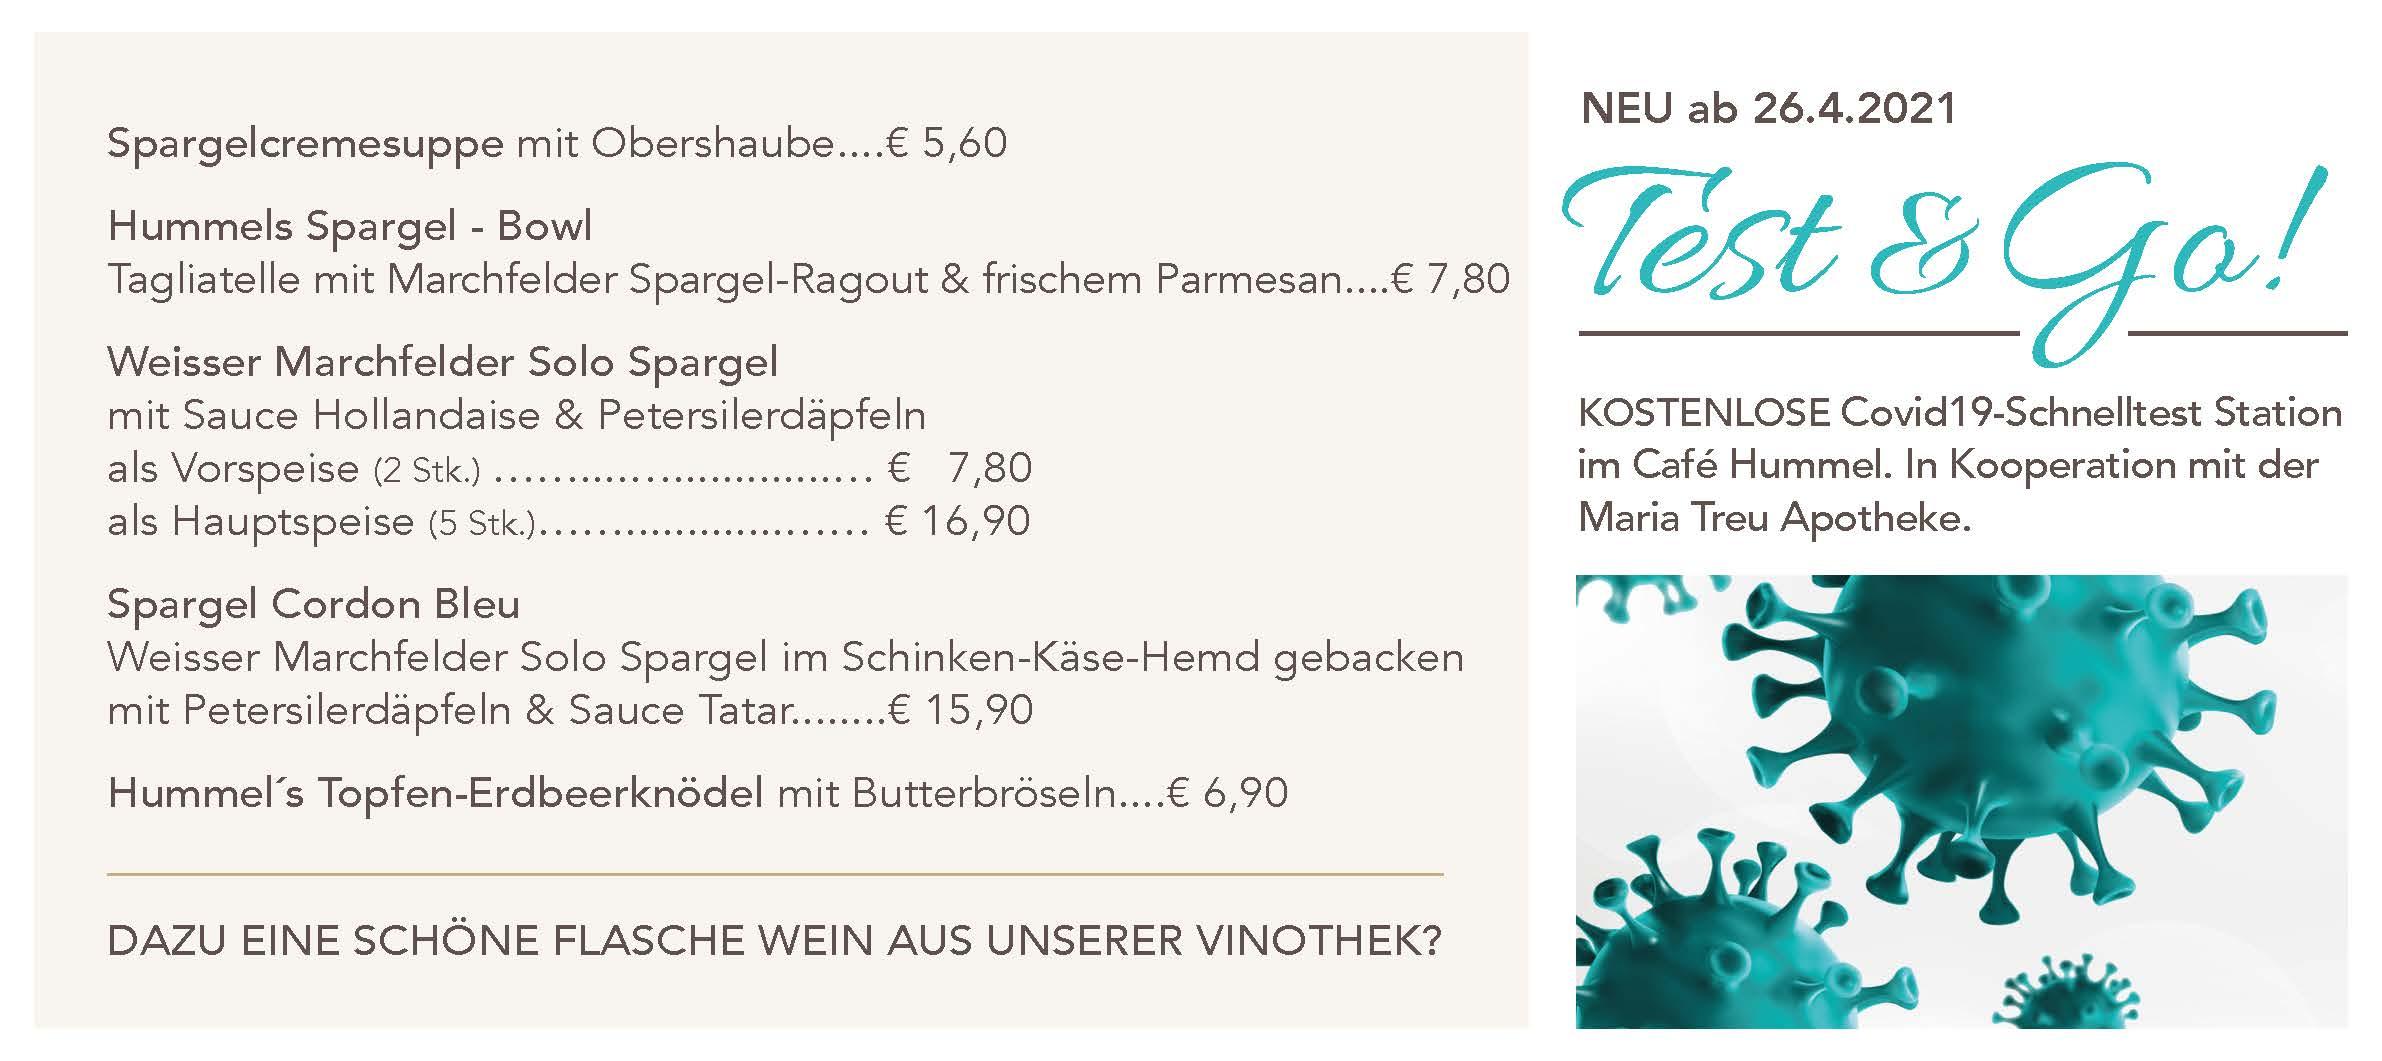 Spargelwoche-CaféHummel